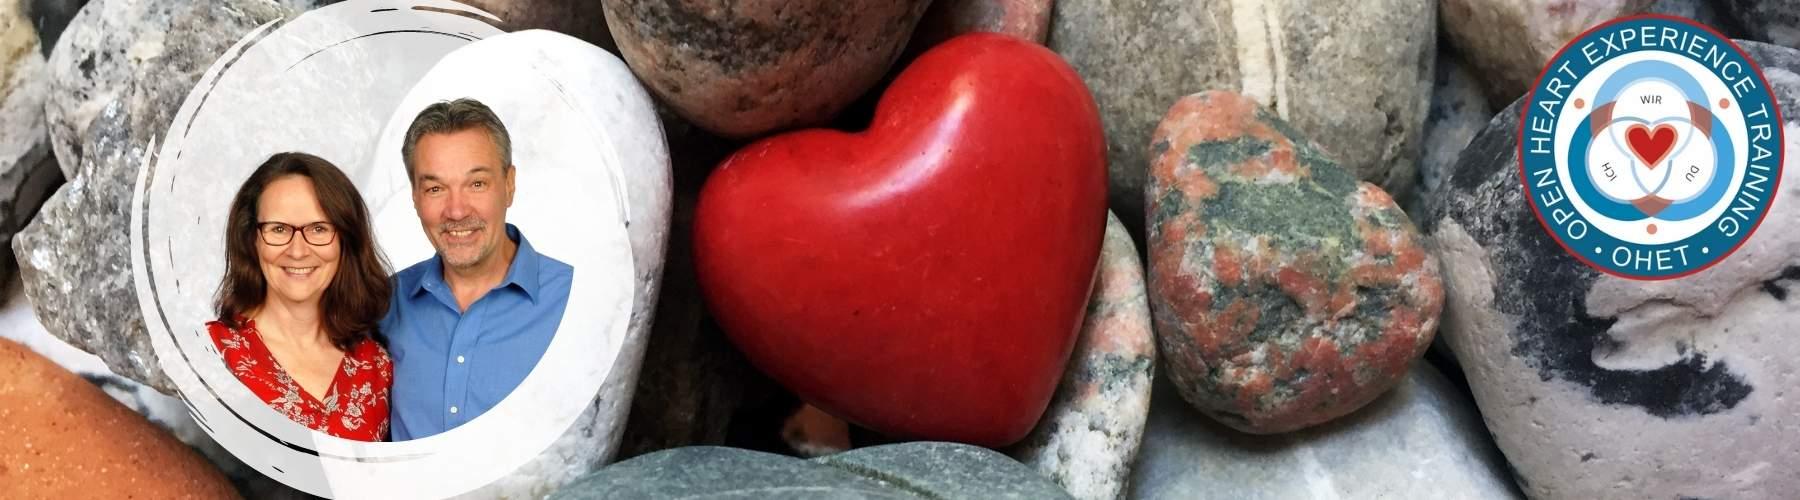 Christine Brekenfeld & Leo Mersch - Open Heart Experience Training